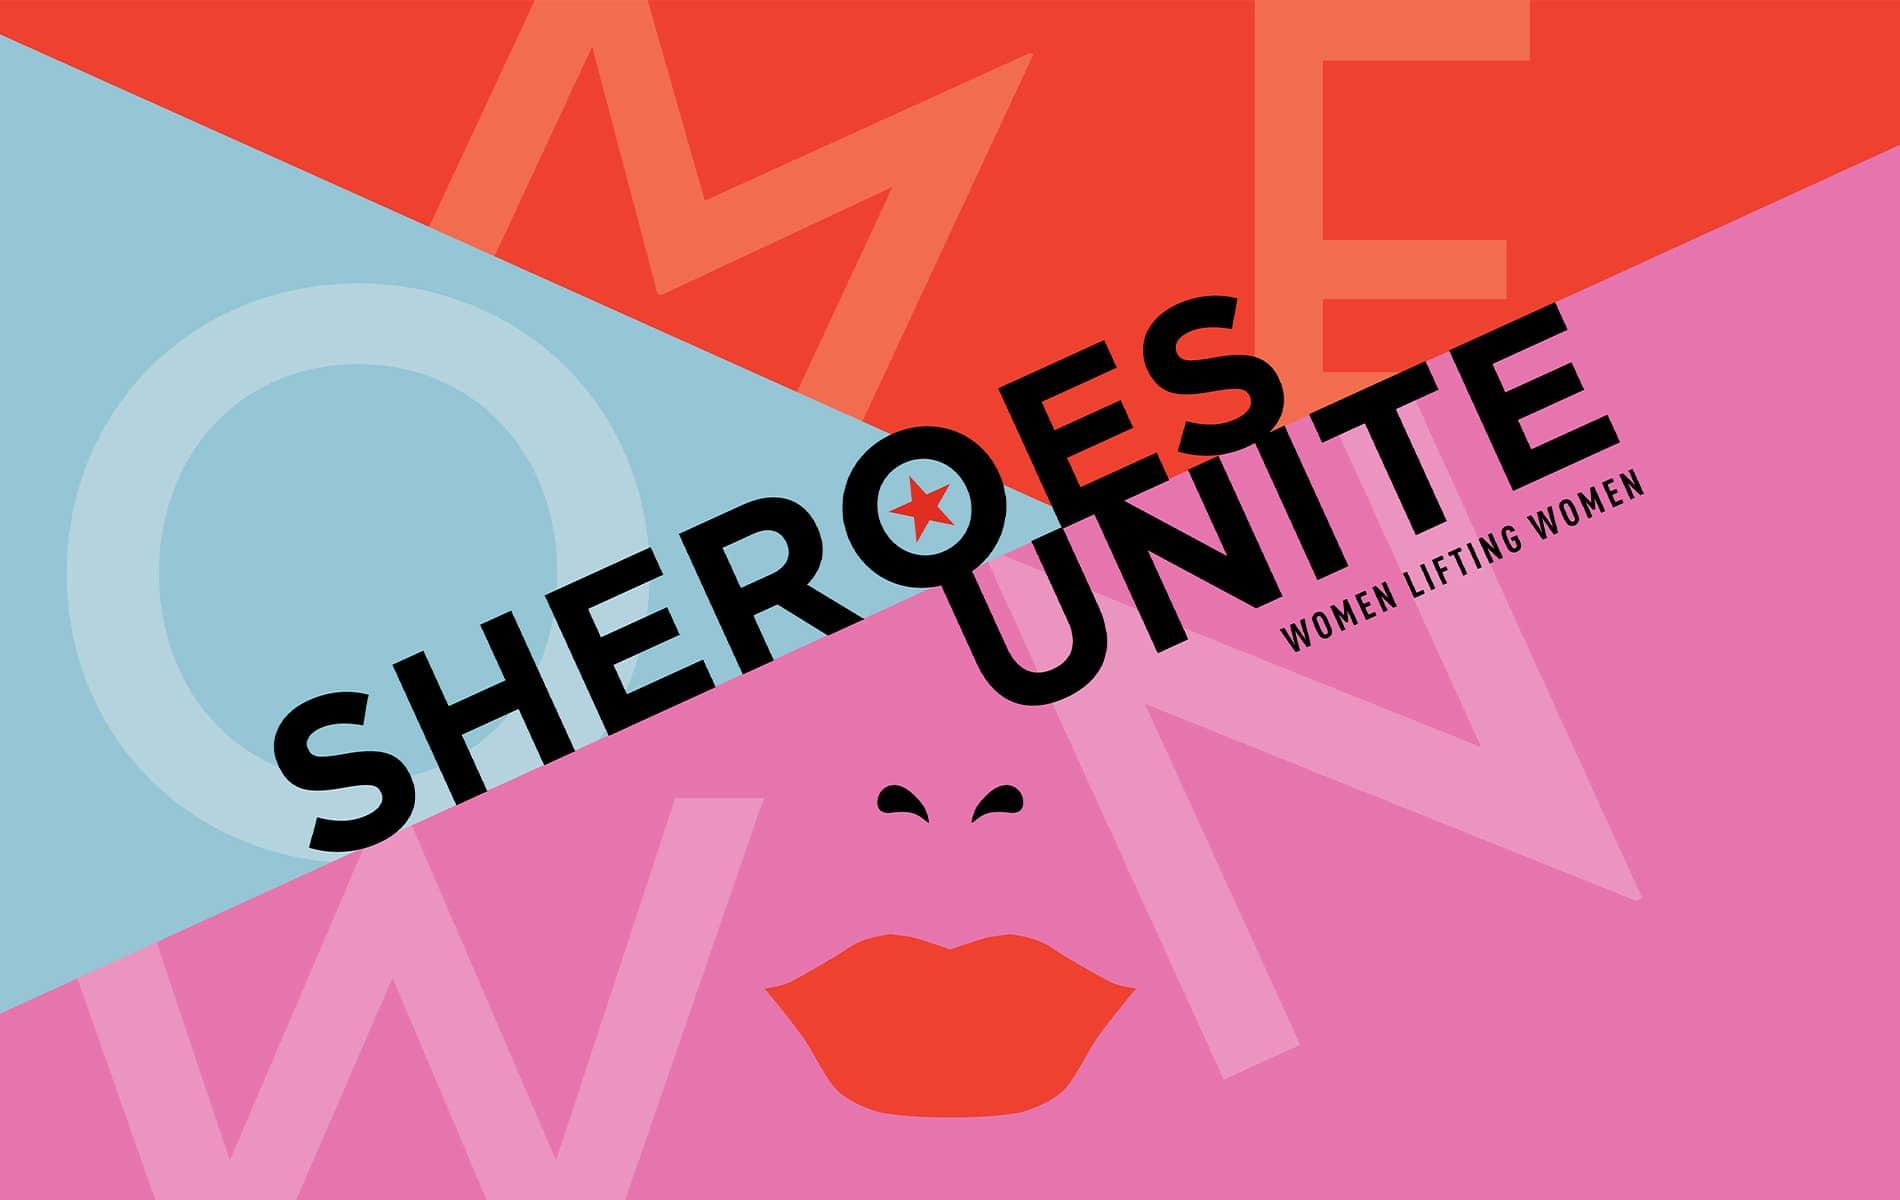 VIE Magazine December 2019 Women's Issue, Sheroes United Women Lifting Women